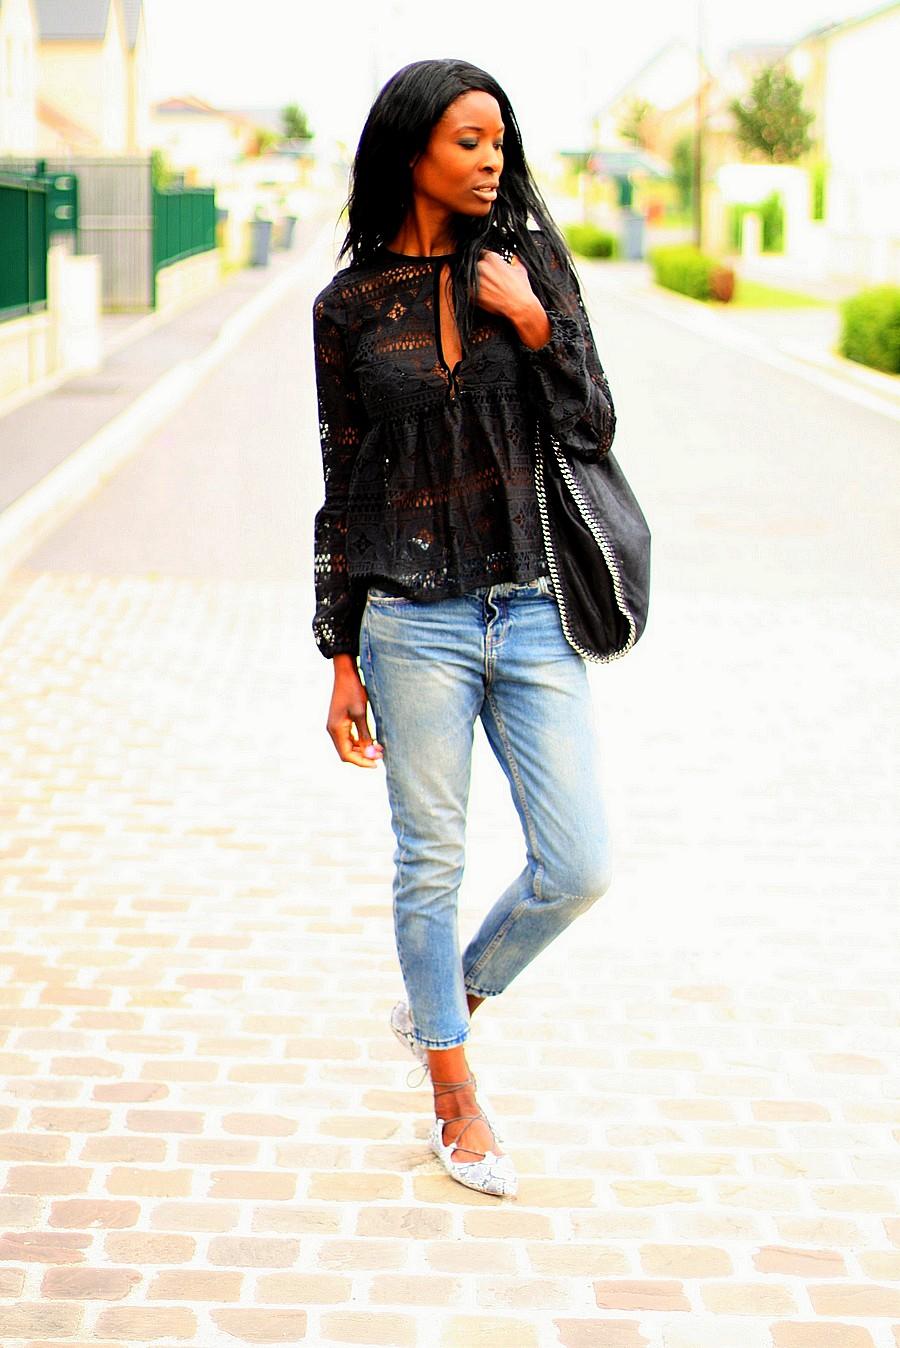 top-dentelle-sac-falabella-stella-mccartney-jeans-boyfriend-mocassins-lacets-topshop-blog-mode